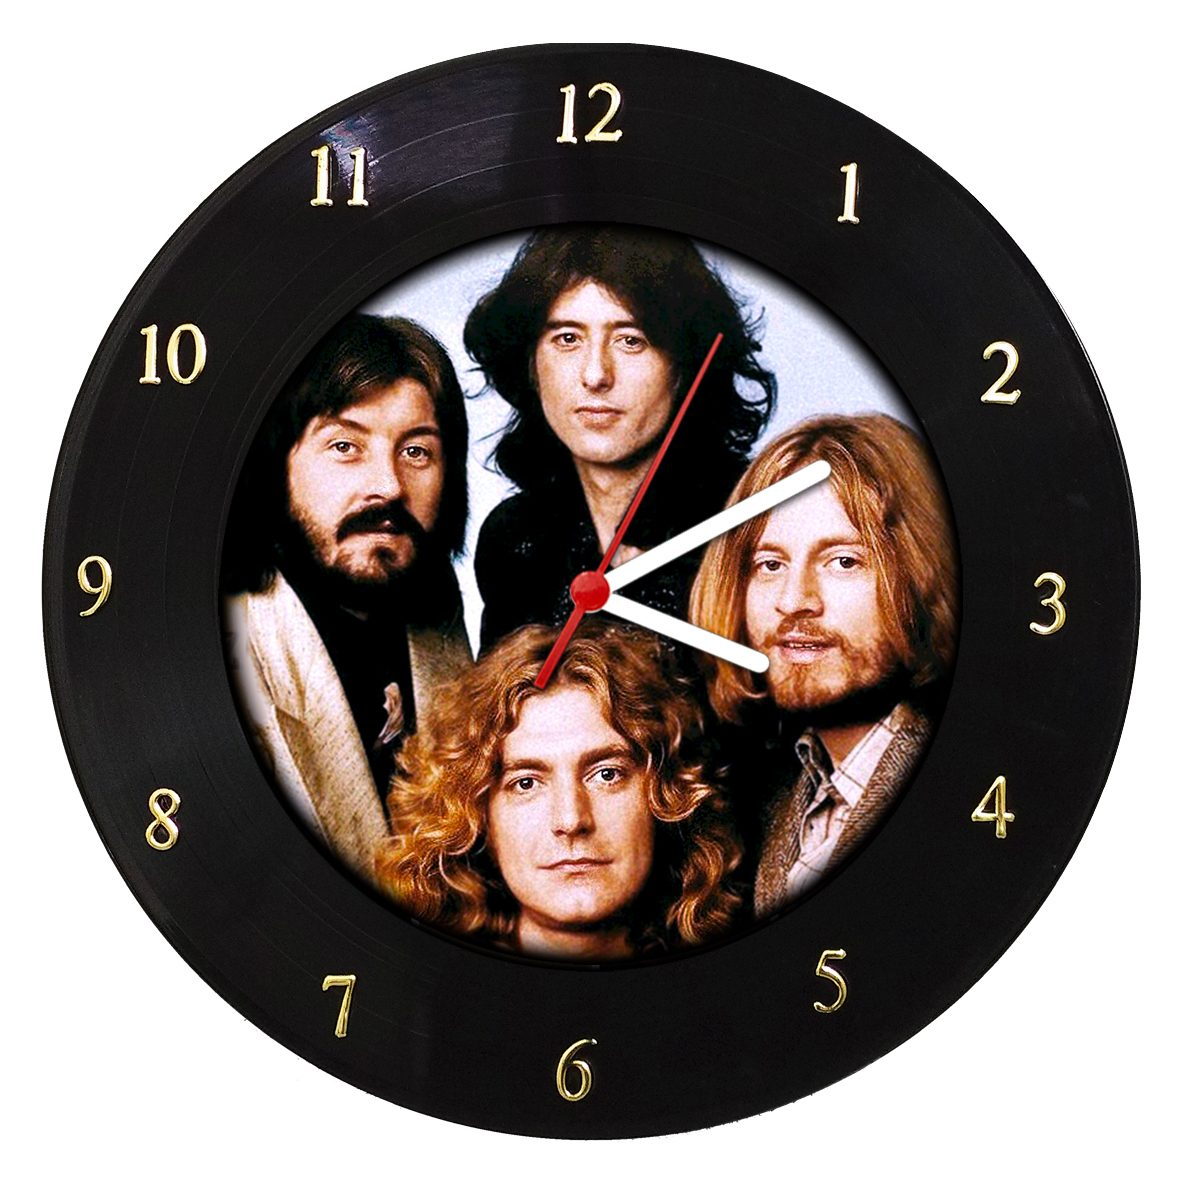 Led Zeppelin - Relógio de Parede em Disco de Vinil - Mr. Rock